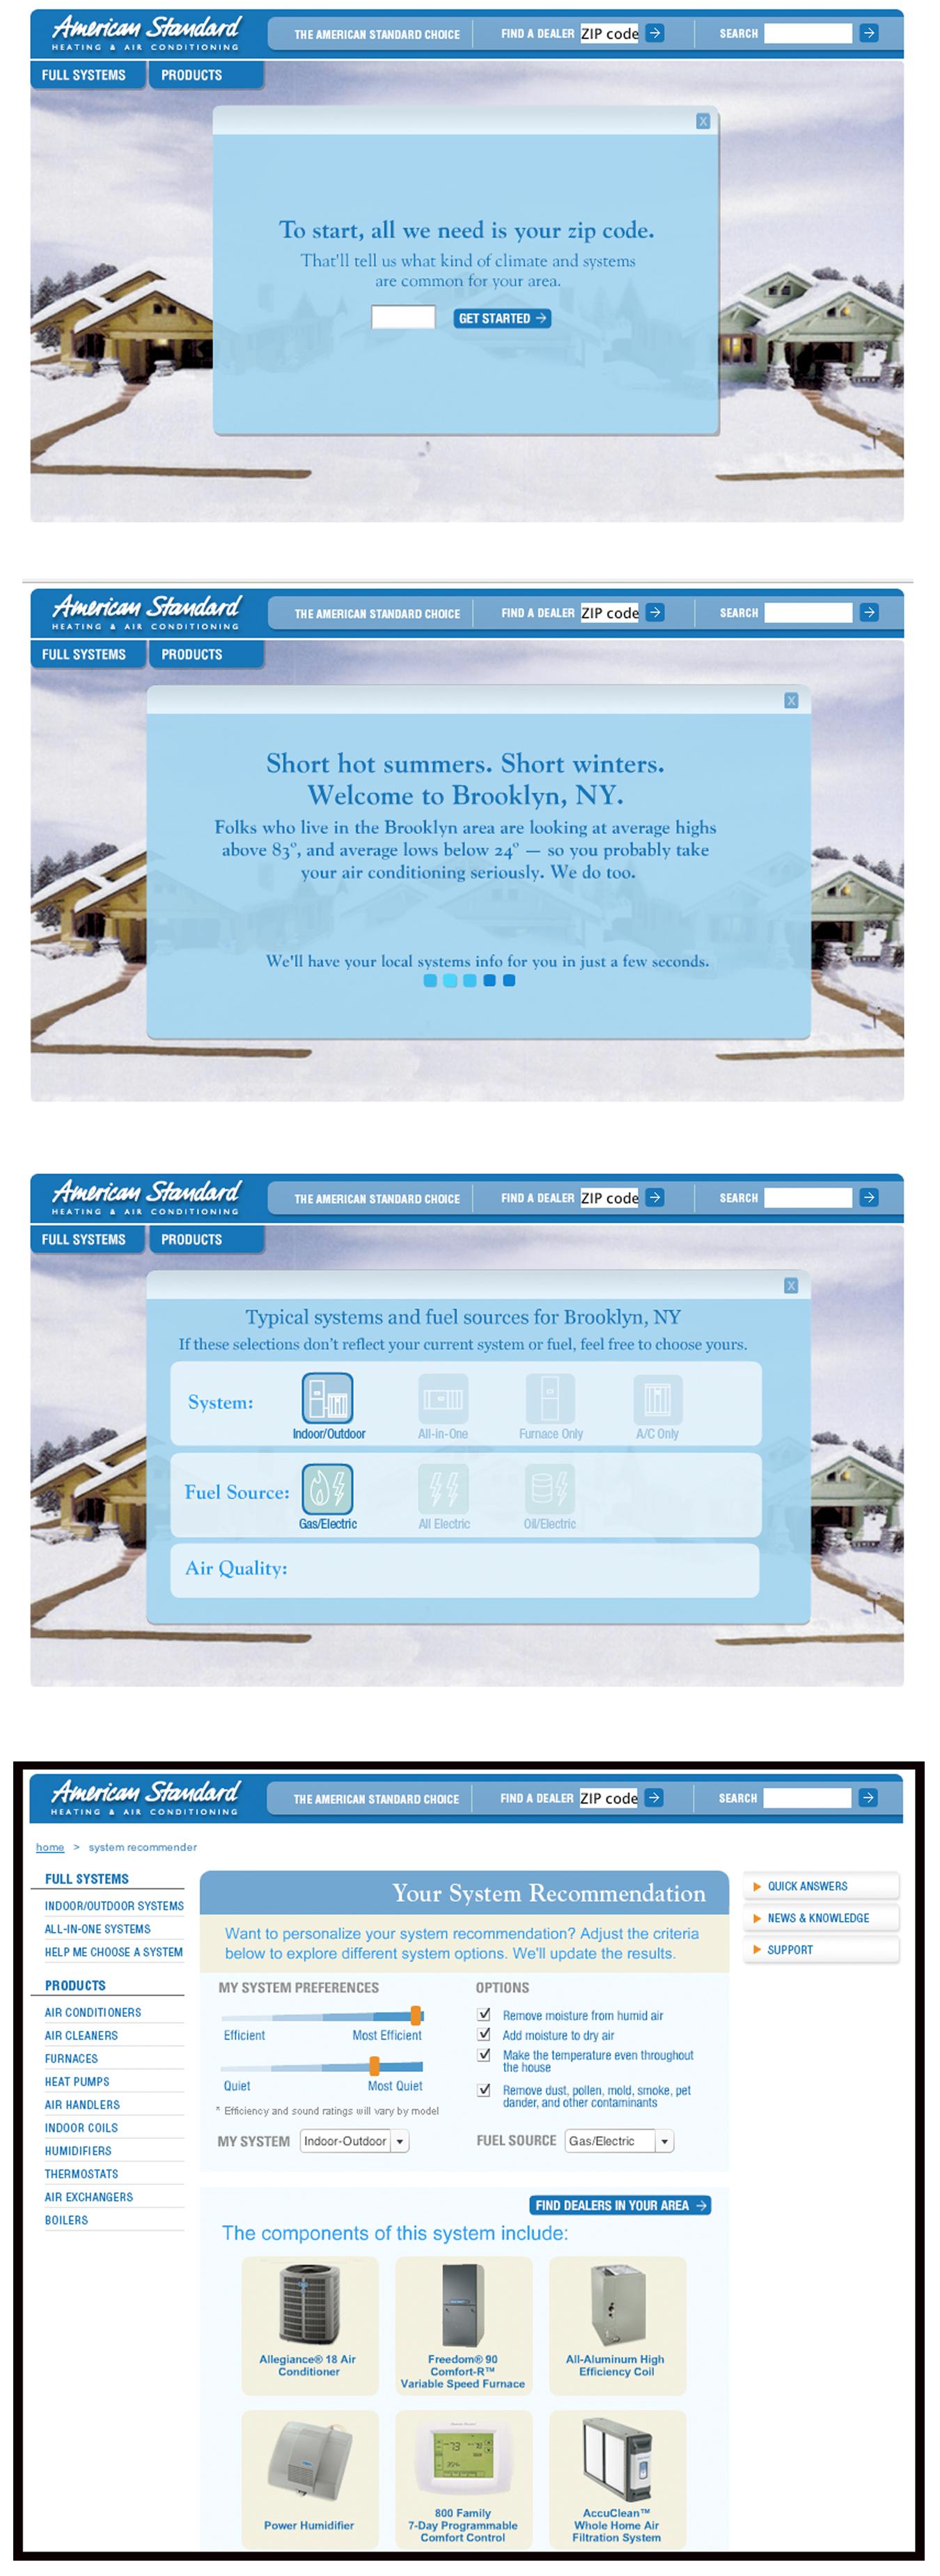 Contemporary American Standard Website Inspiration - Bathroom and ...